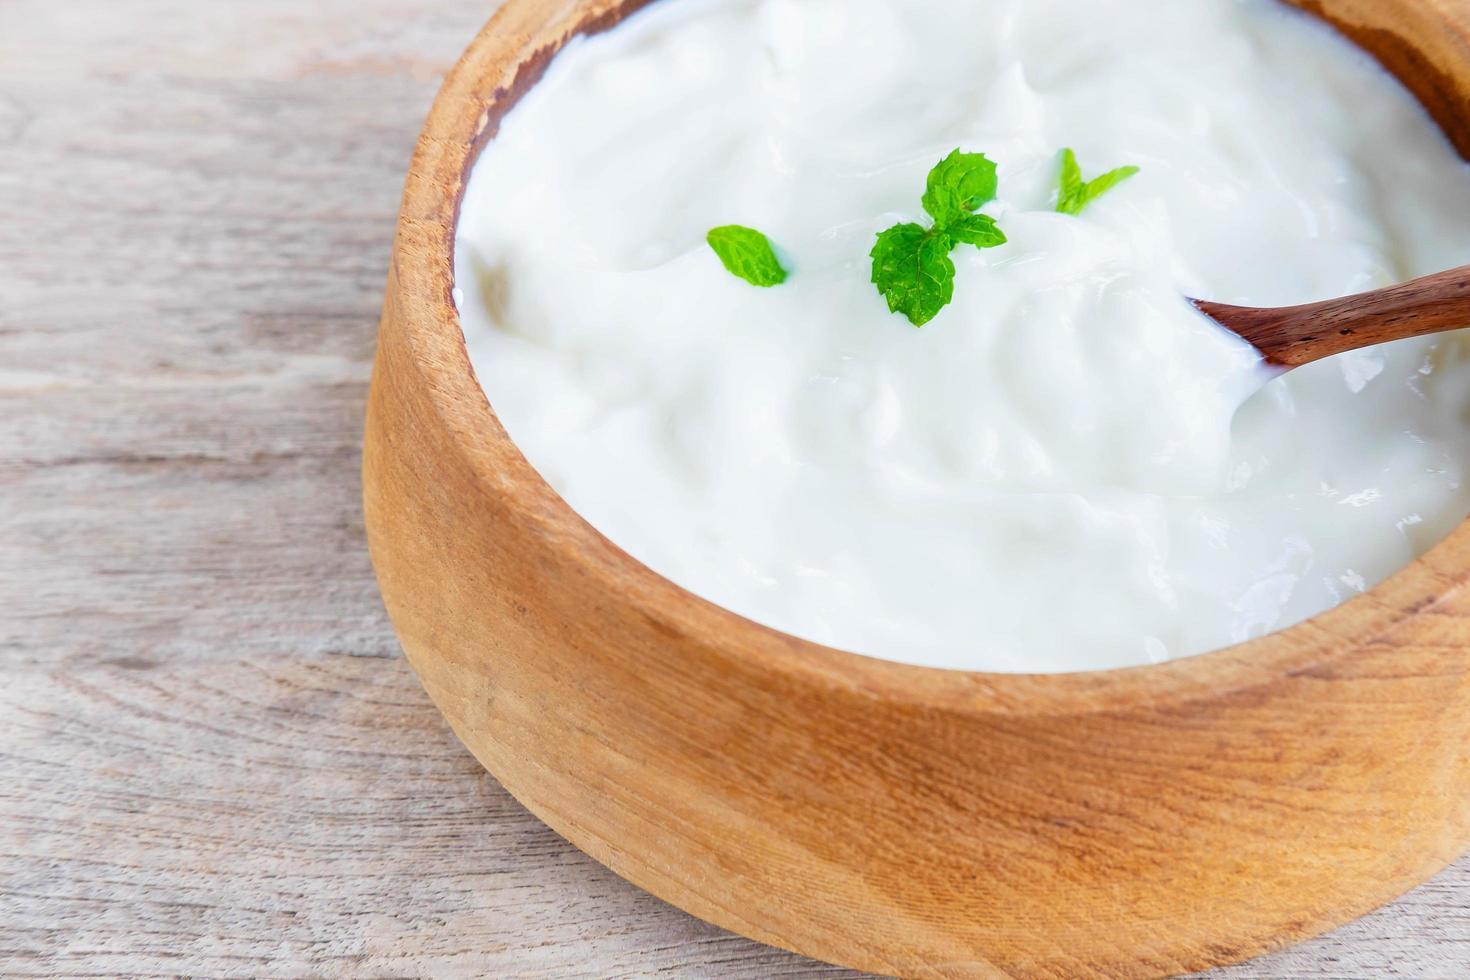 Yogur natural saludable en una mesa de madera foto